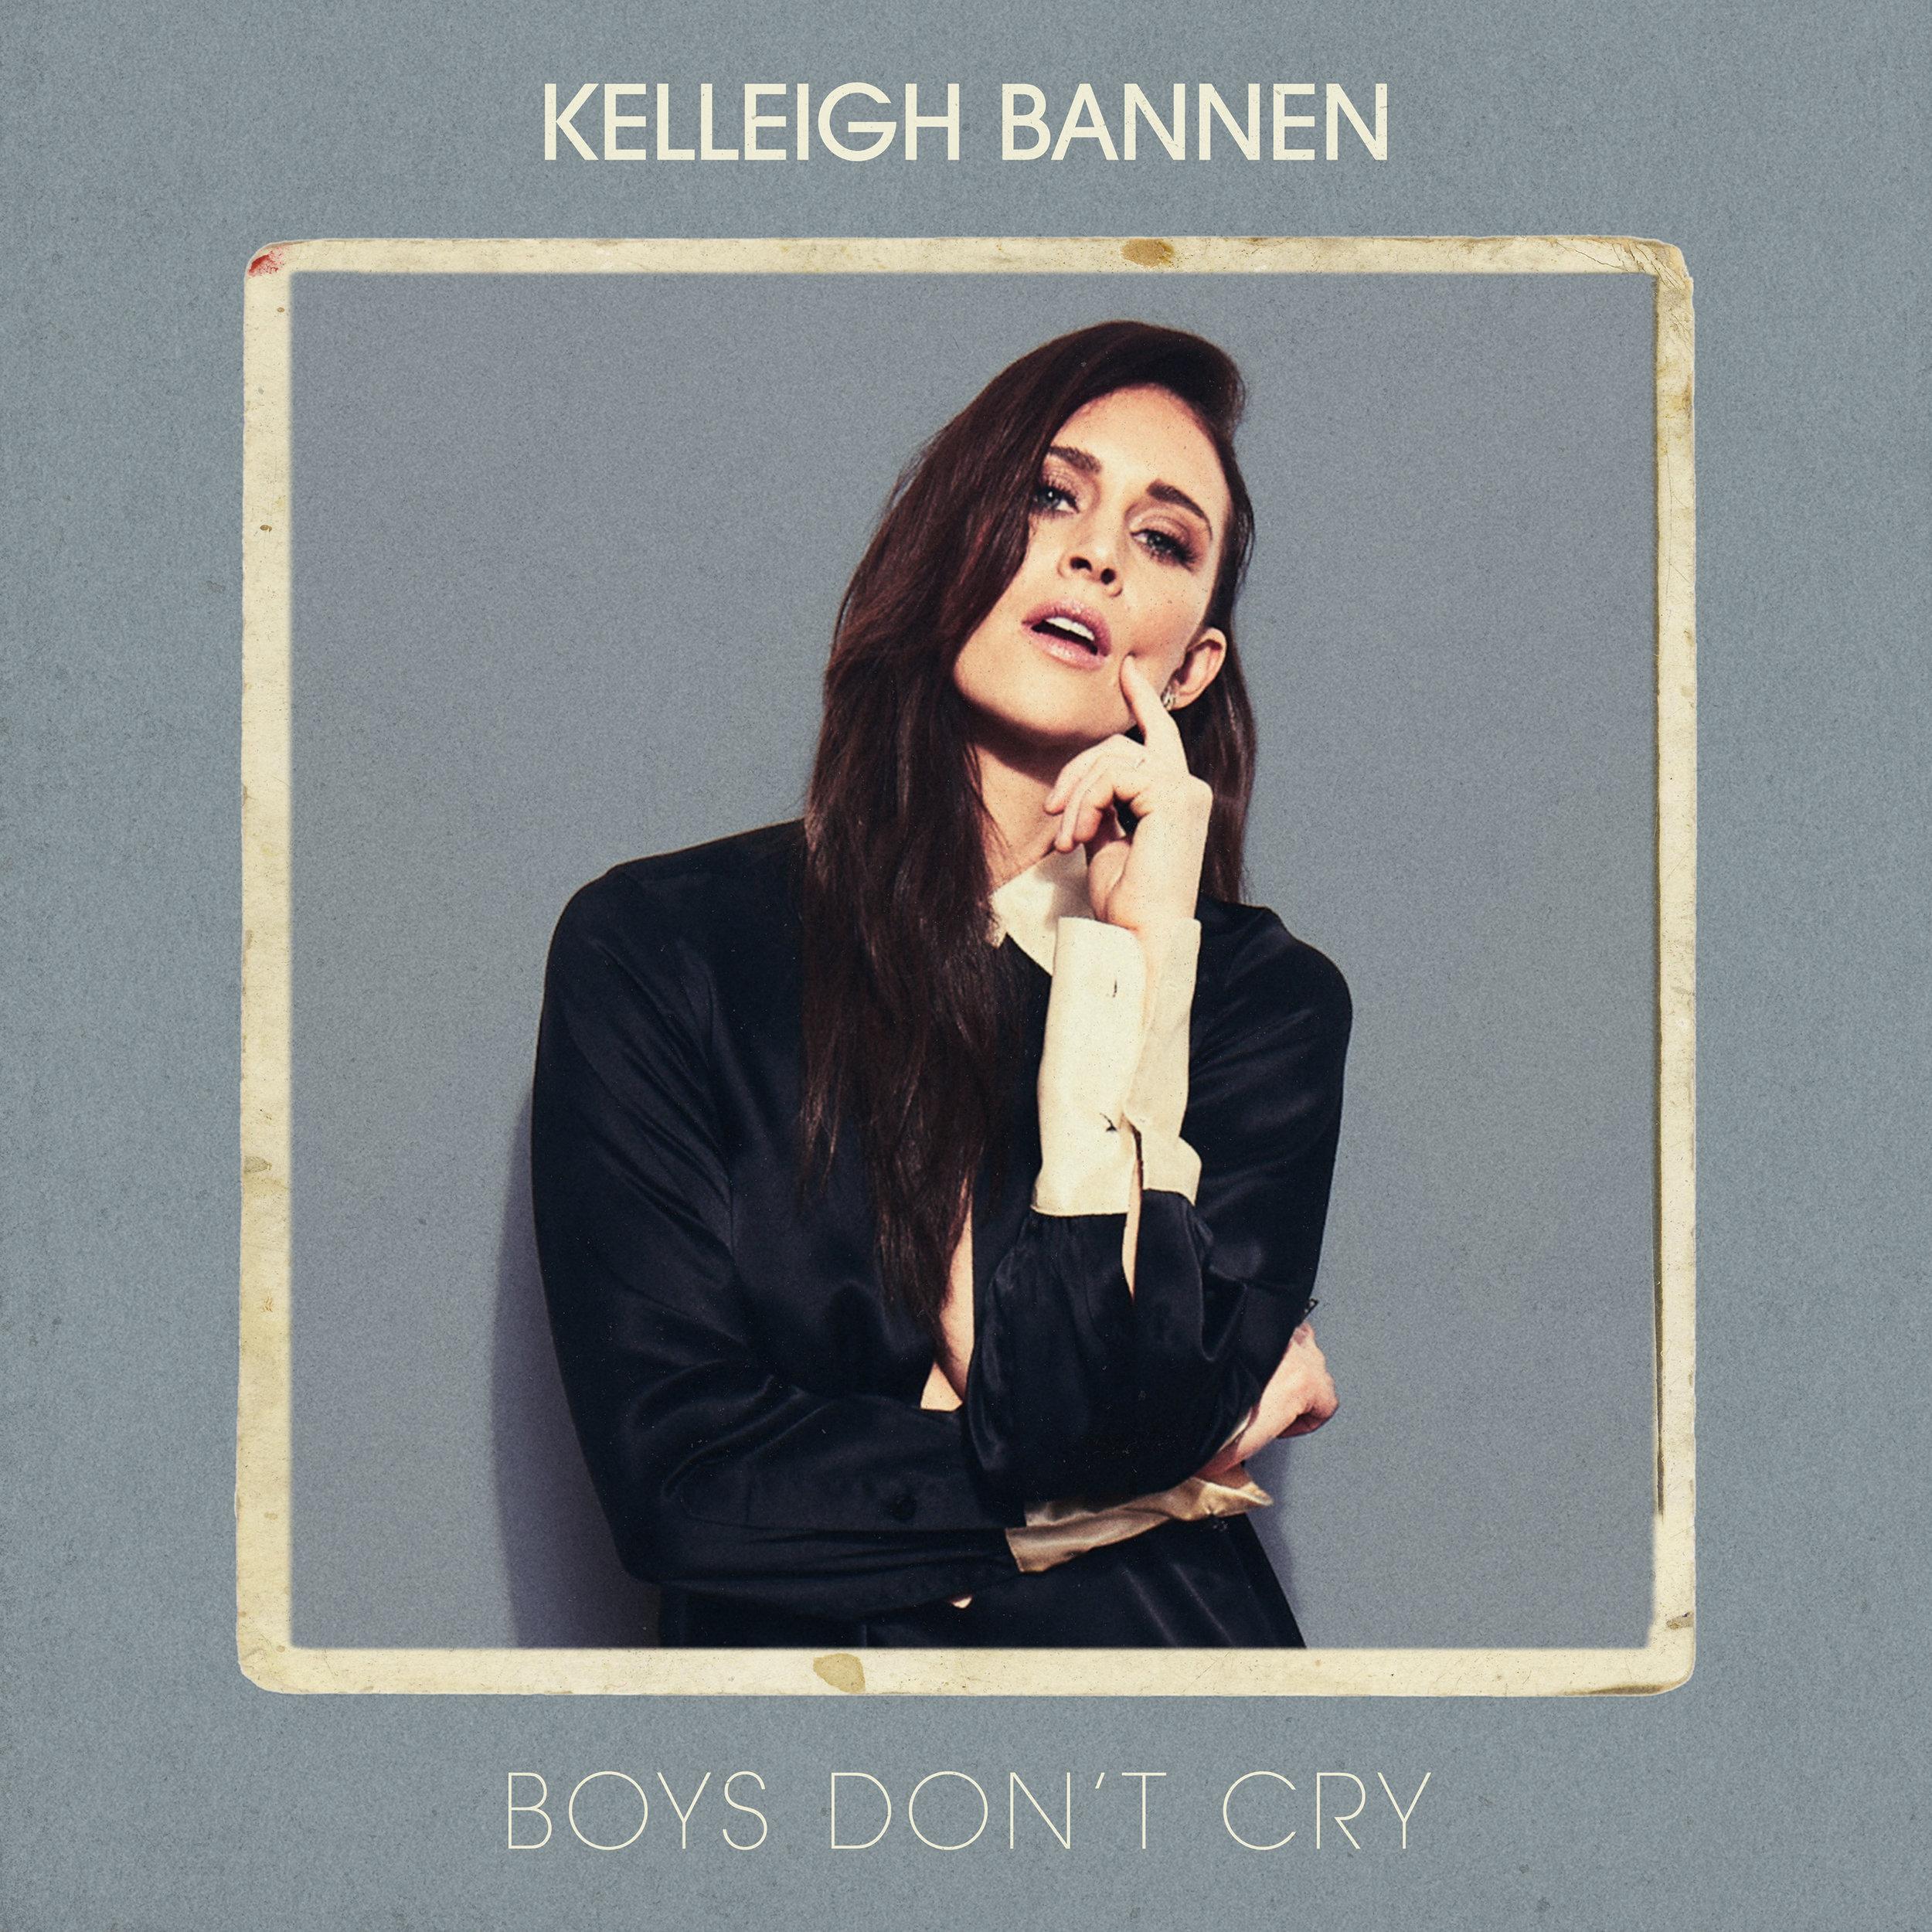 KELLEIGH_BANNEN-BOYS_DONT_CRY.jpg